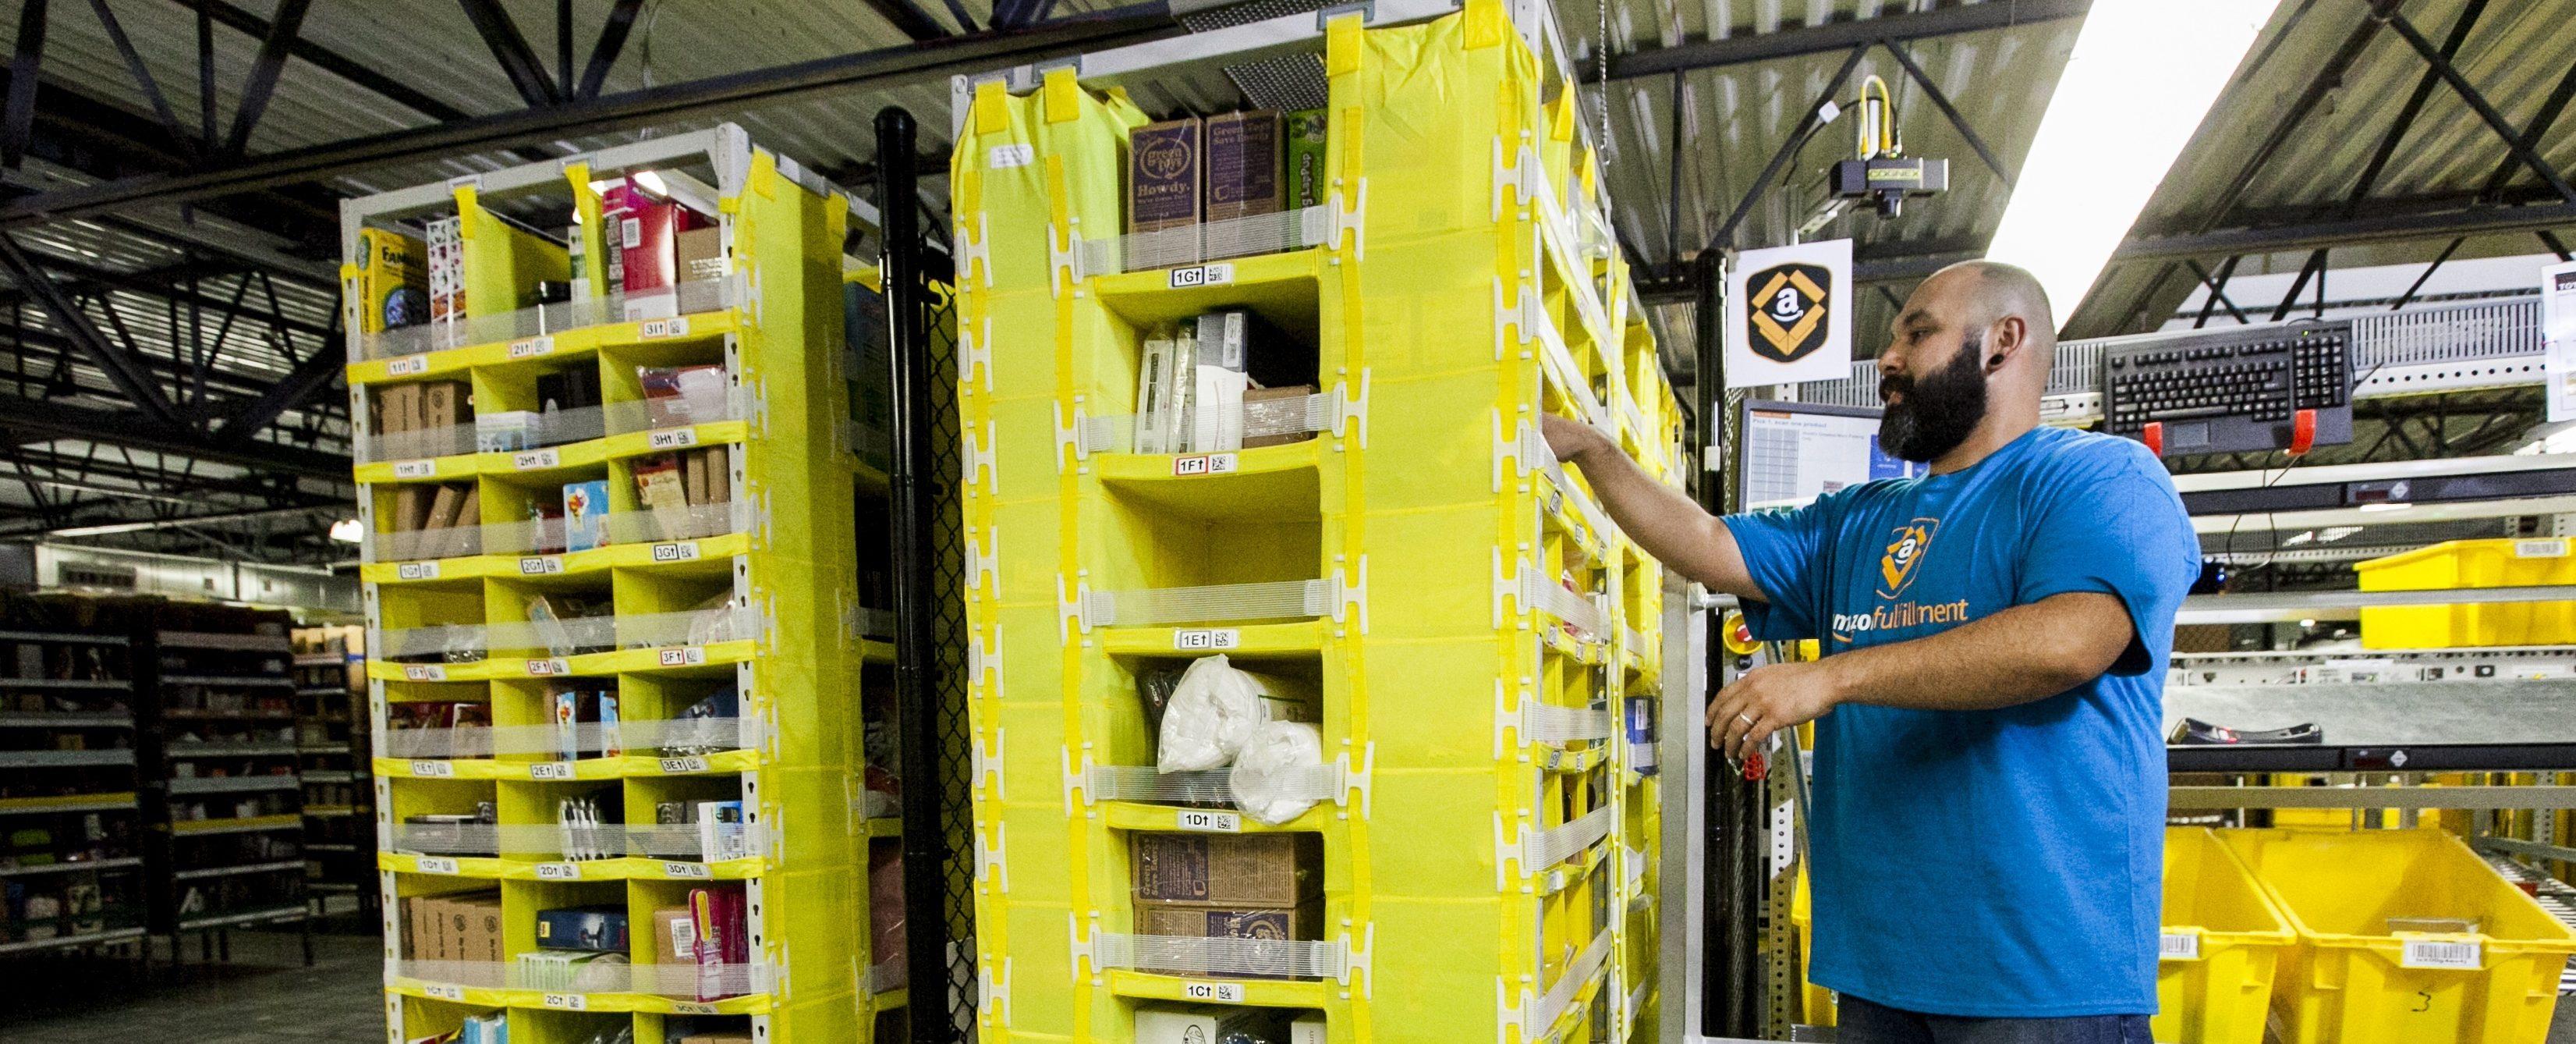 Amazon Announces New Fulfillment Centre 600 Jobs Near Edmonton It World Canada News